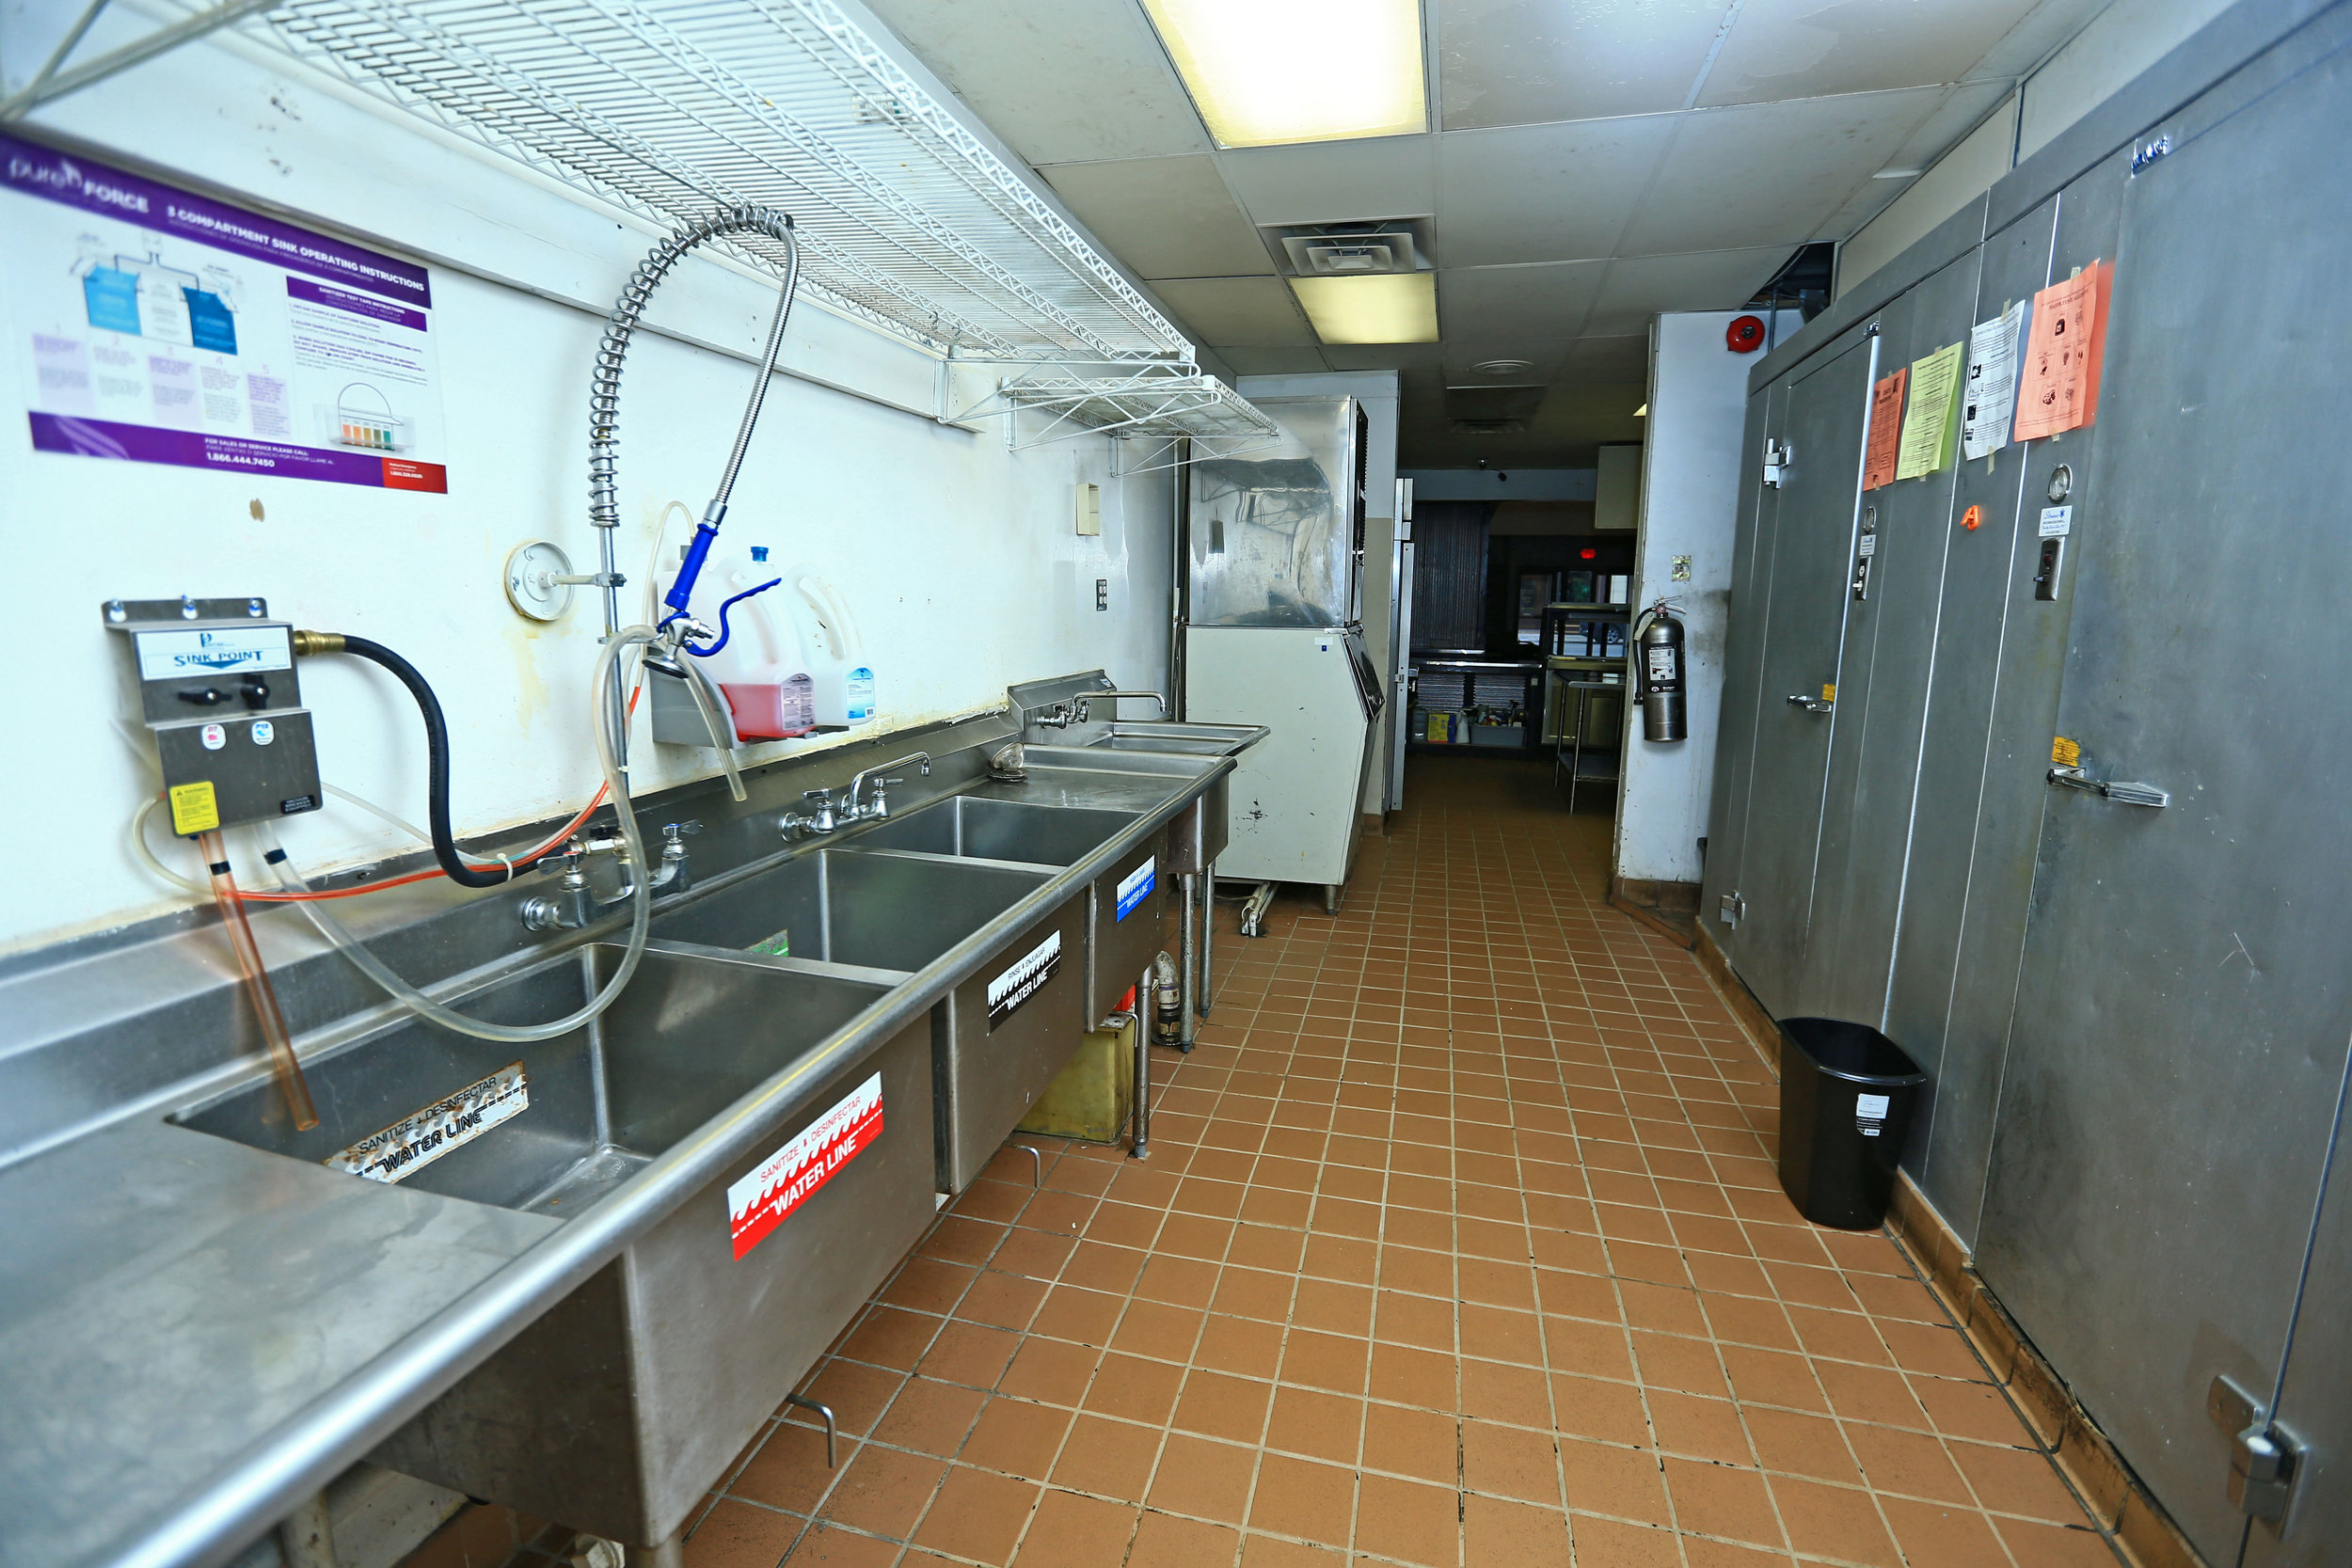 Kitchen sinks and refrigerator and freezer.jpg